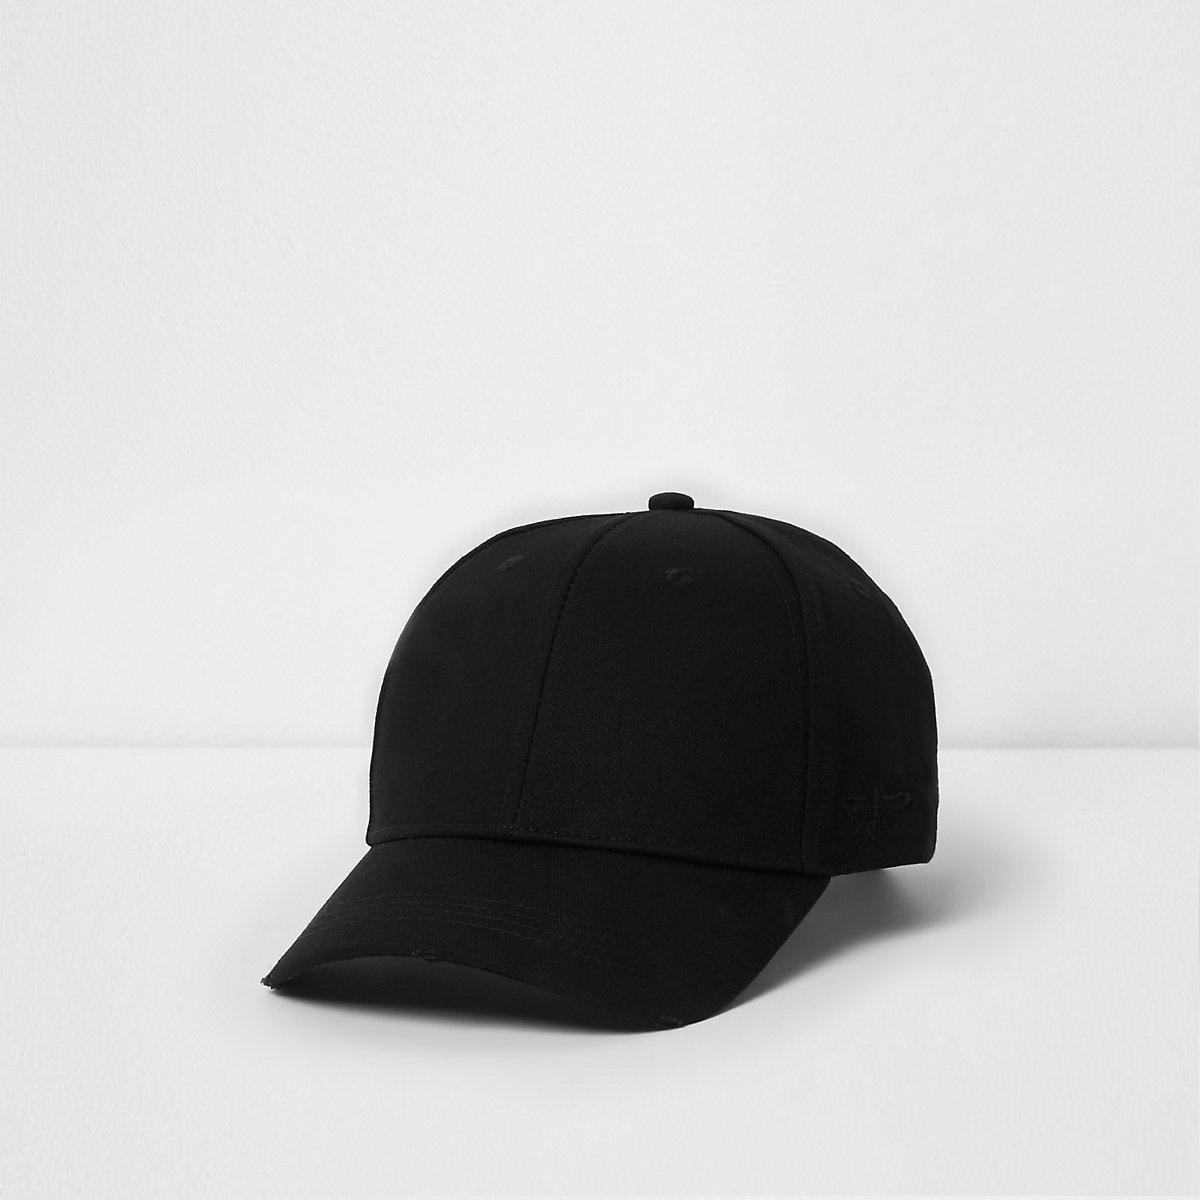 Black wasp embroidered baseball cap